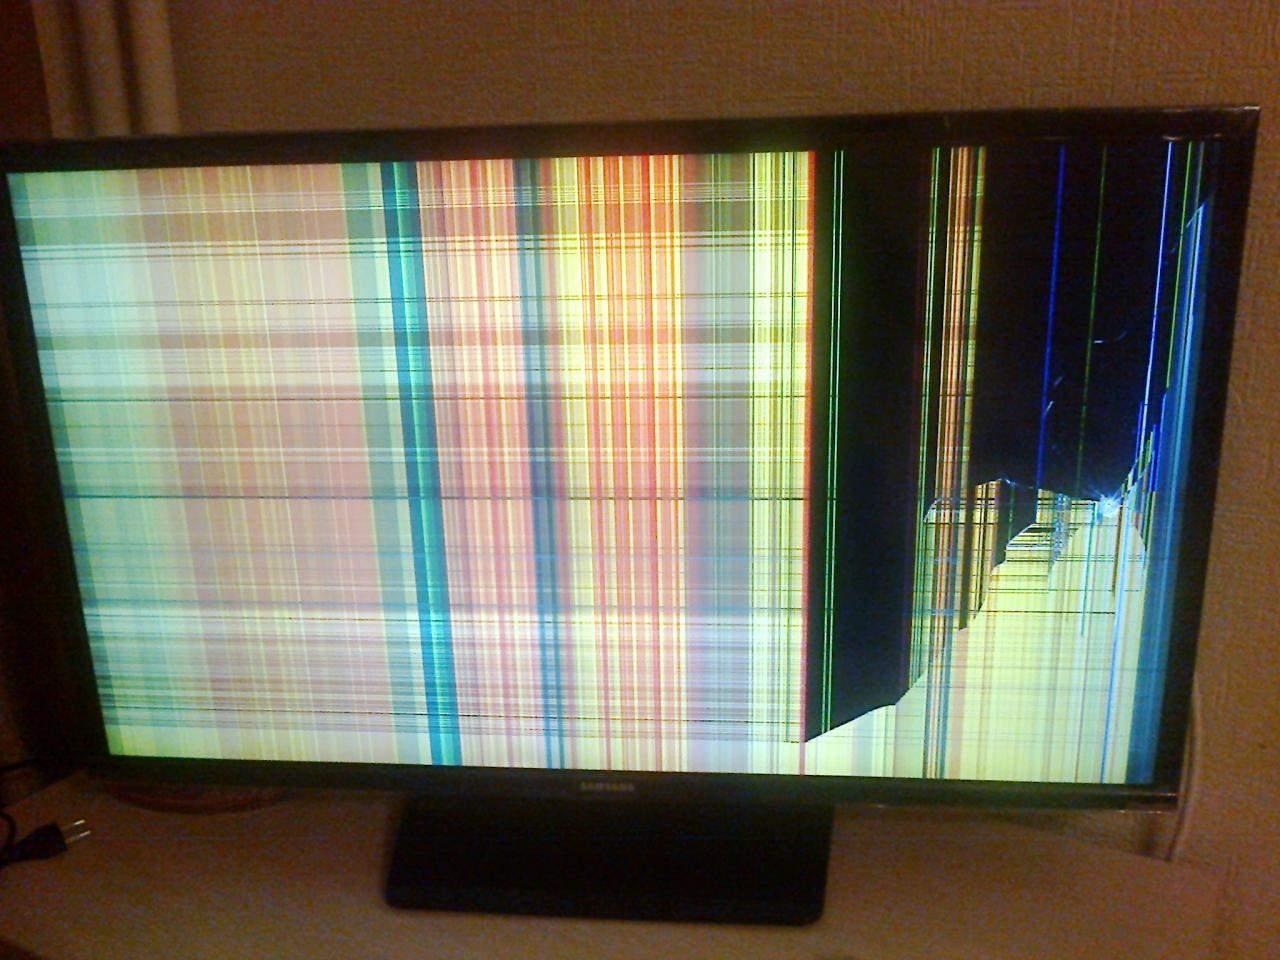 схема телевизора vestel vr37tf 1445